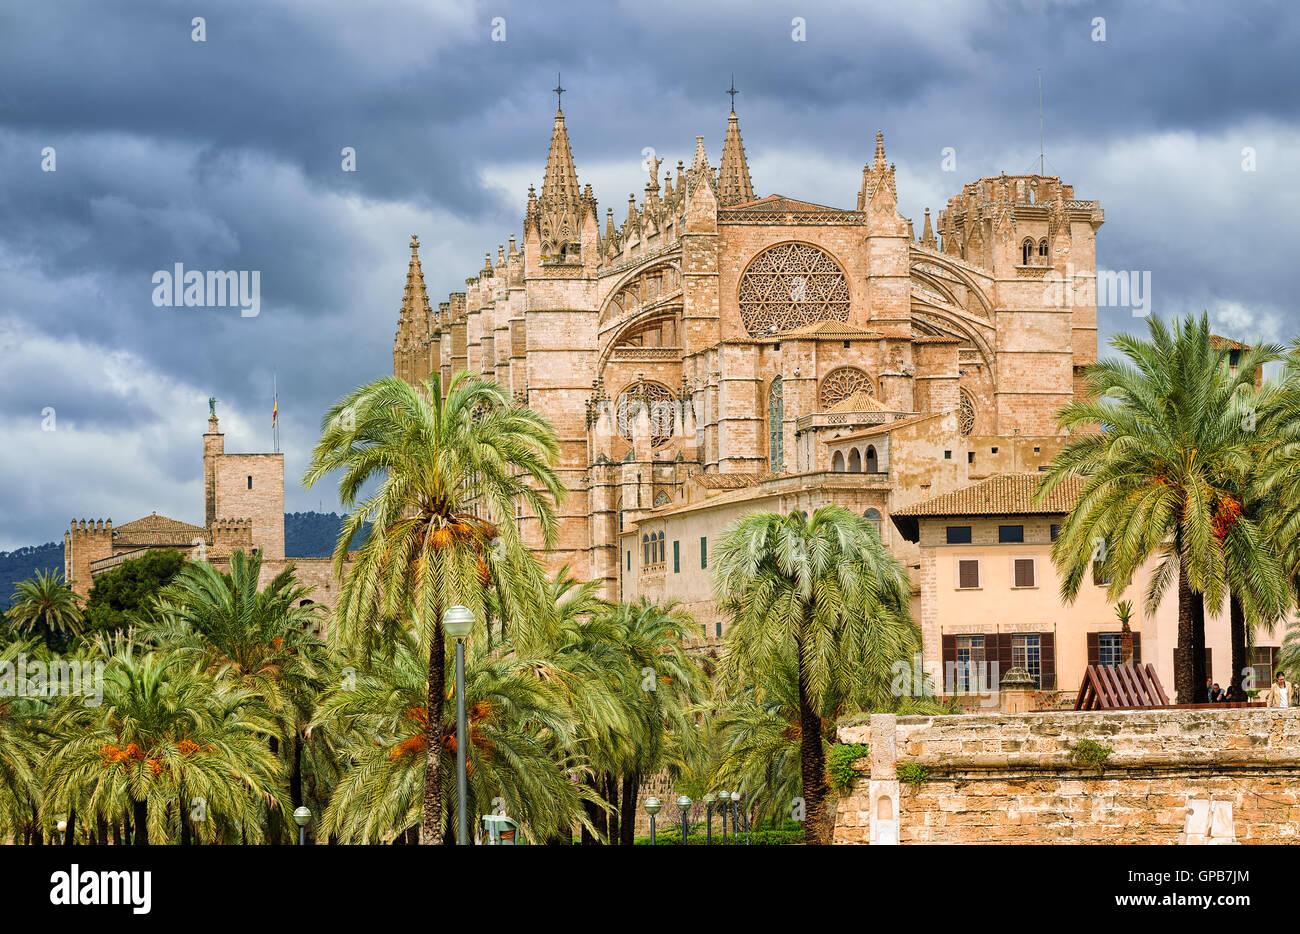 La Seu, mittelalterliche gotische Kathedrale von Palma De Mallorca, im Palmengarten, Spanien Stockbild